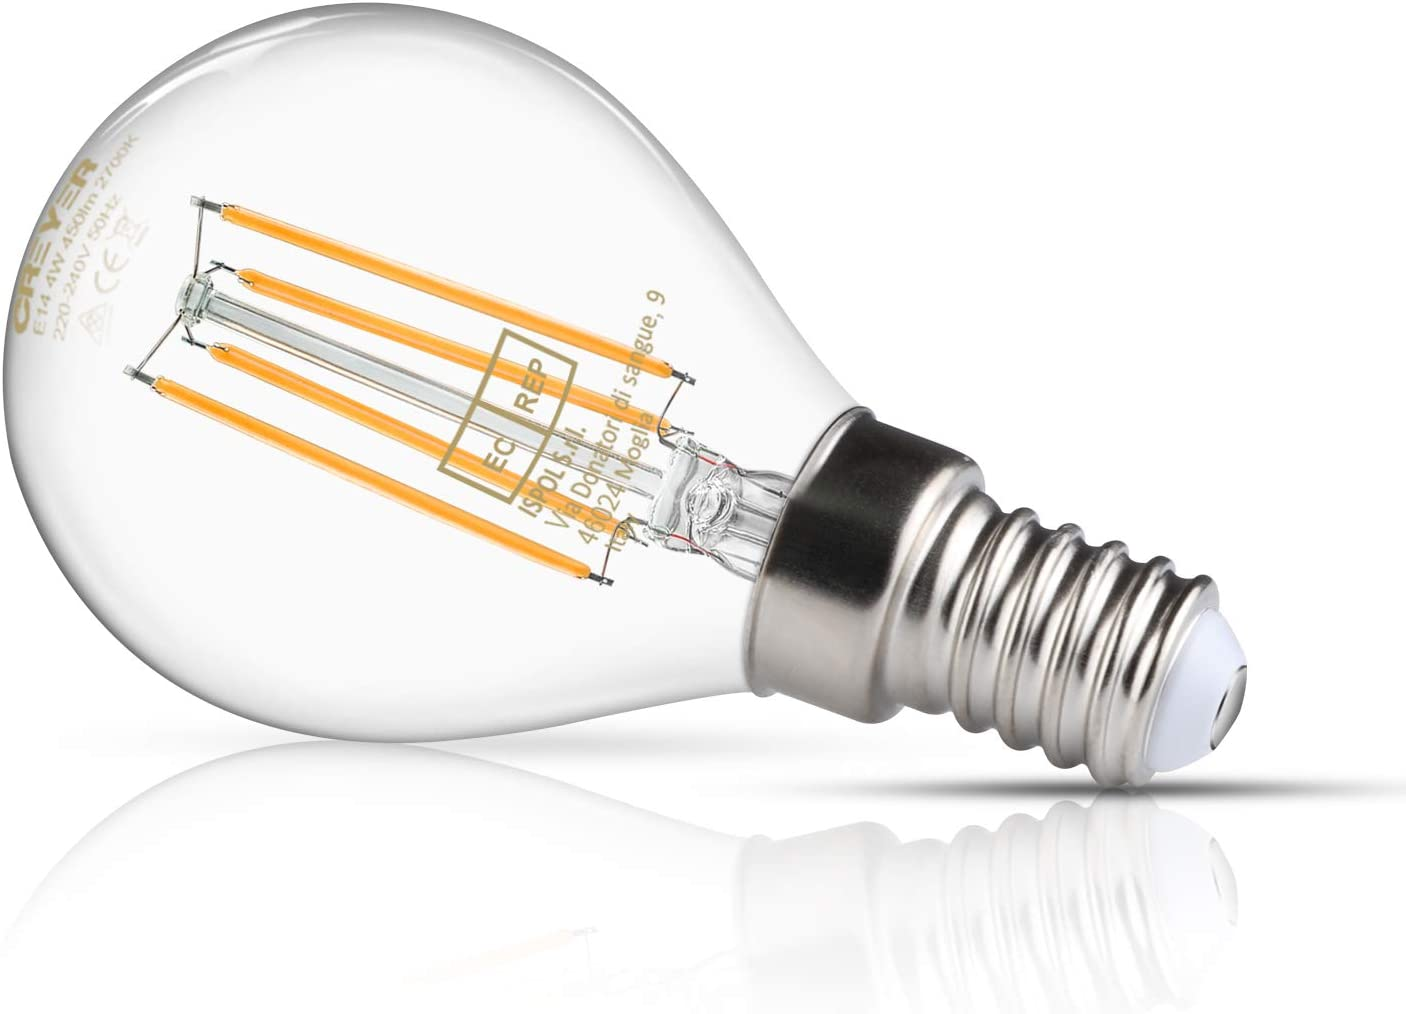 AC 220V-240V Warm White Equivalent to 40W Incandescent Bulbs CRI/≥95+ E14 Screw Base LED Glass Bulbs Pack of 5 450Lumens Creyer E14 G45 LED Filament Bulbs 2700K Non-Dimmable